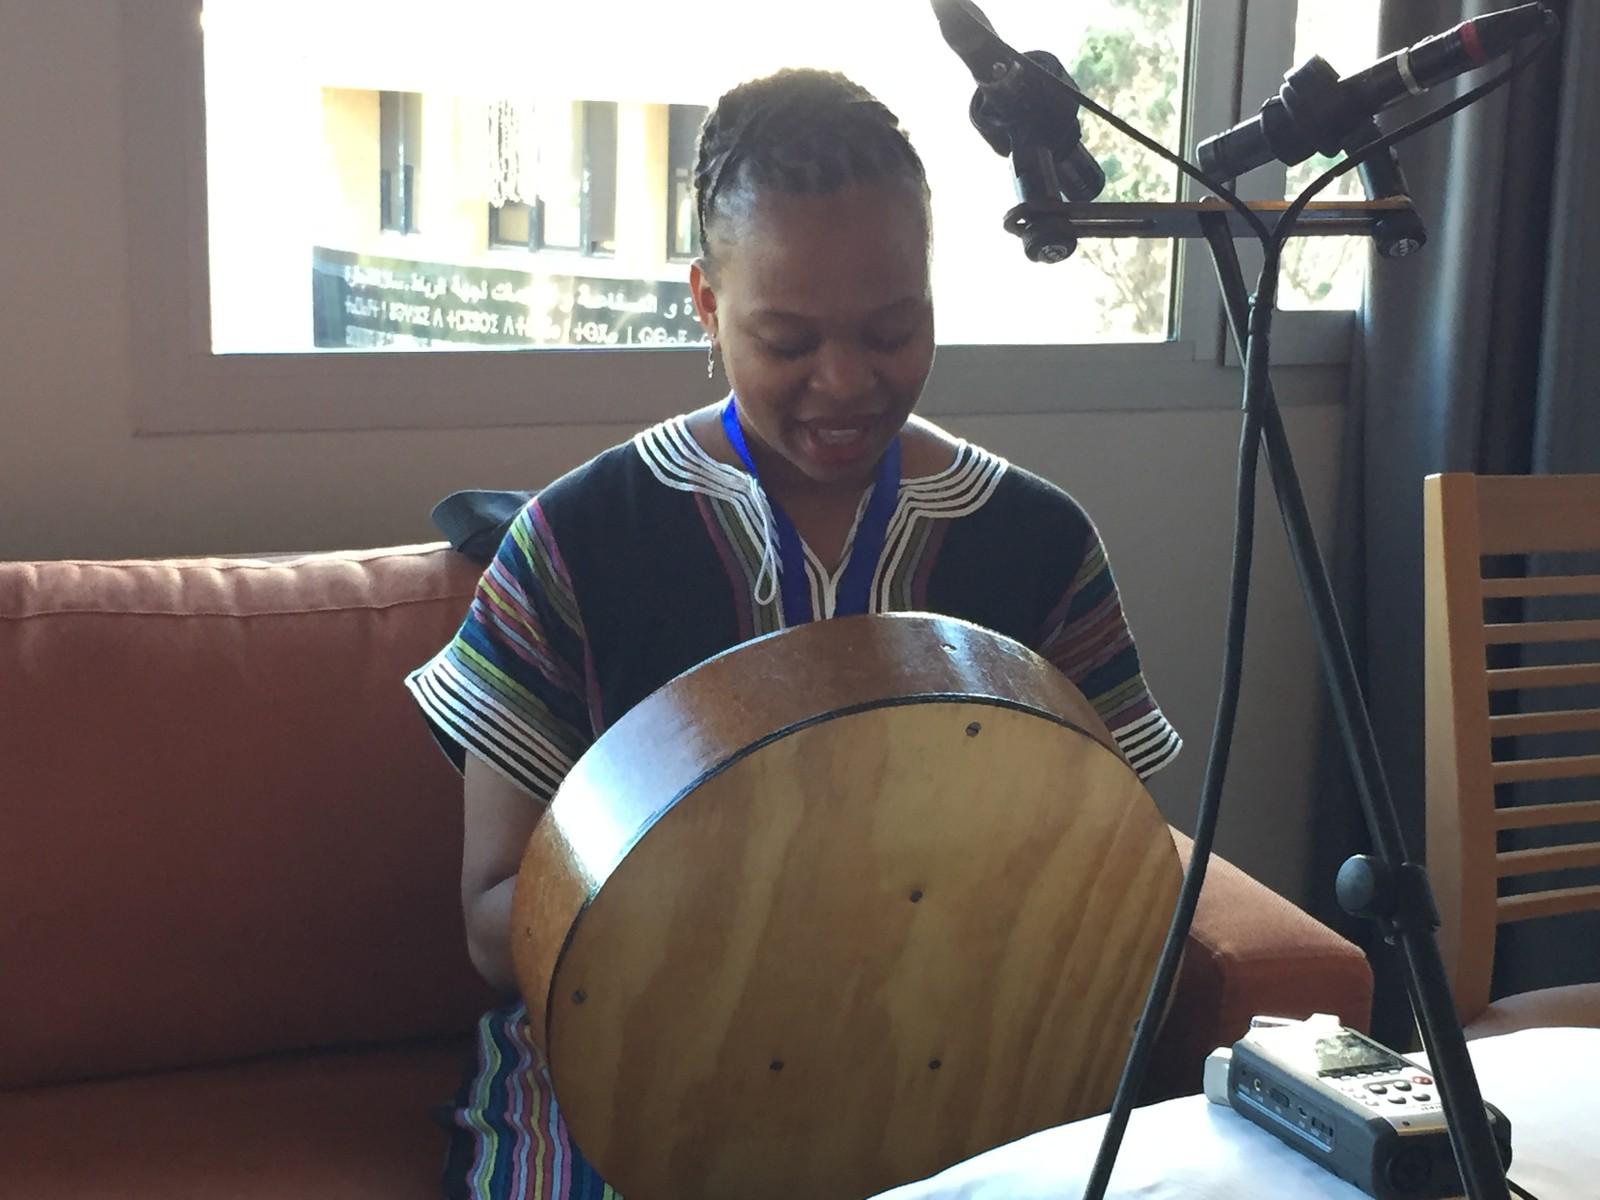 Session på hotellrom i Rabat i Marokko under Visa For Music 2016.